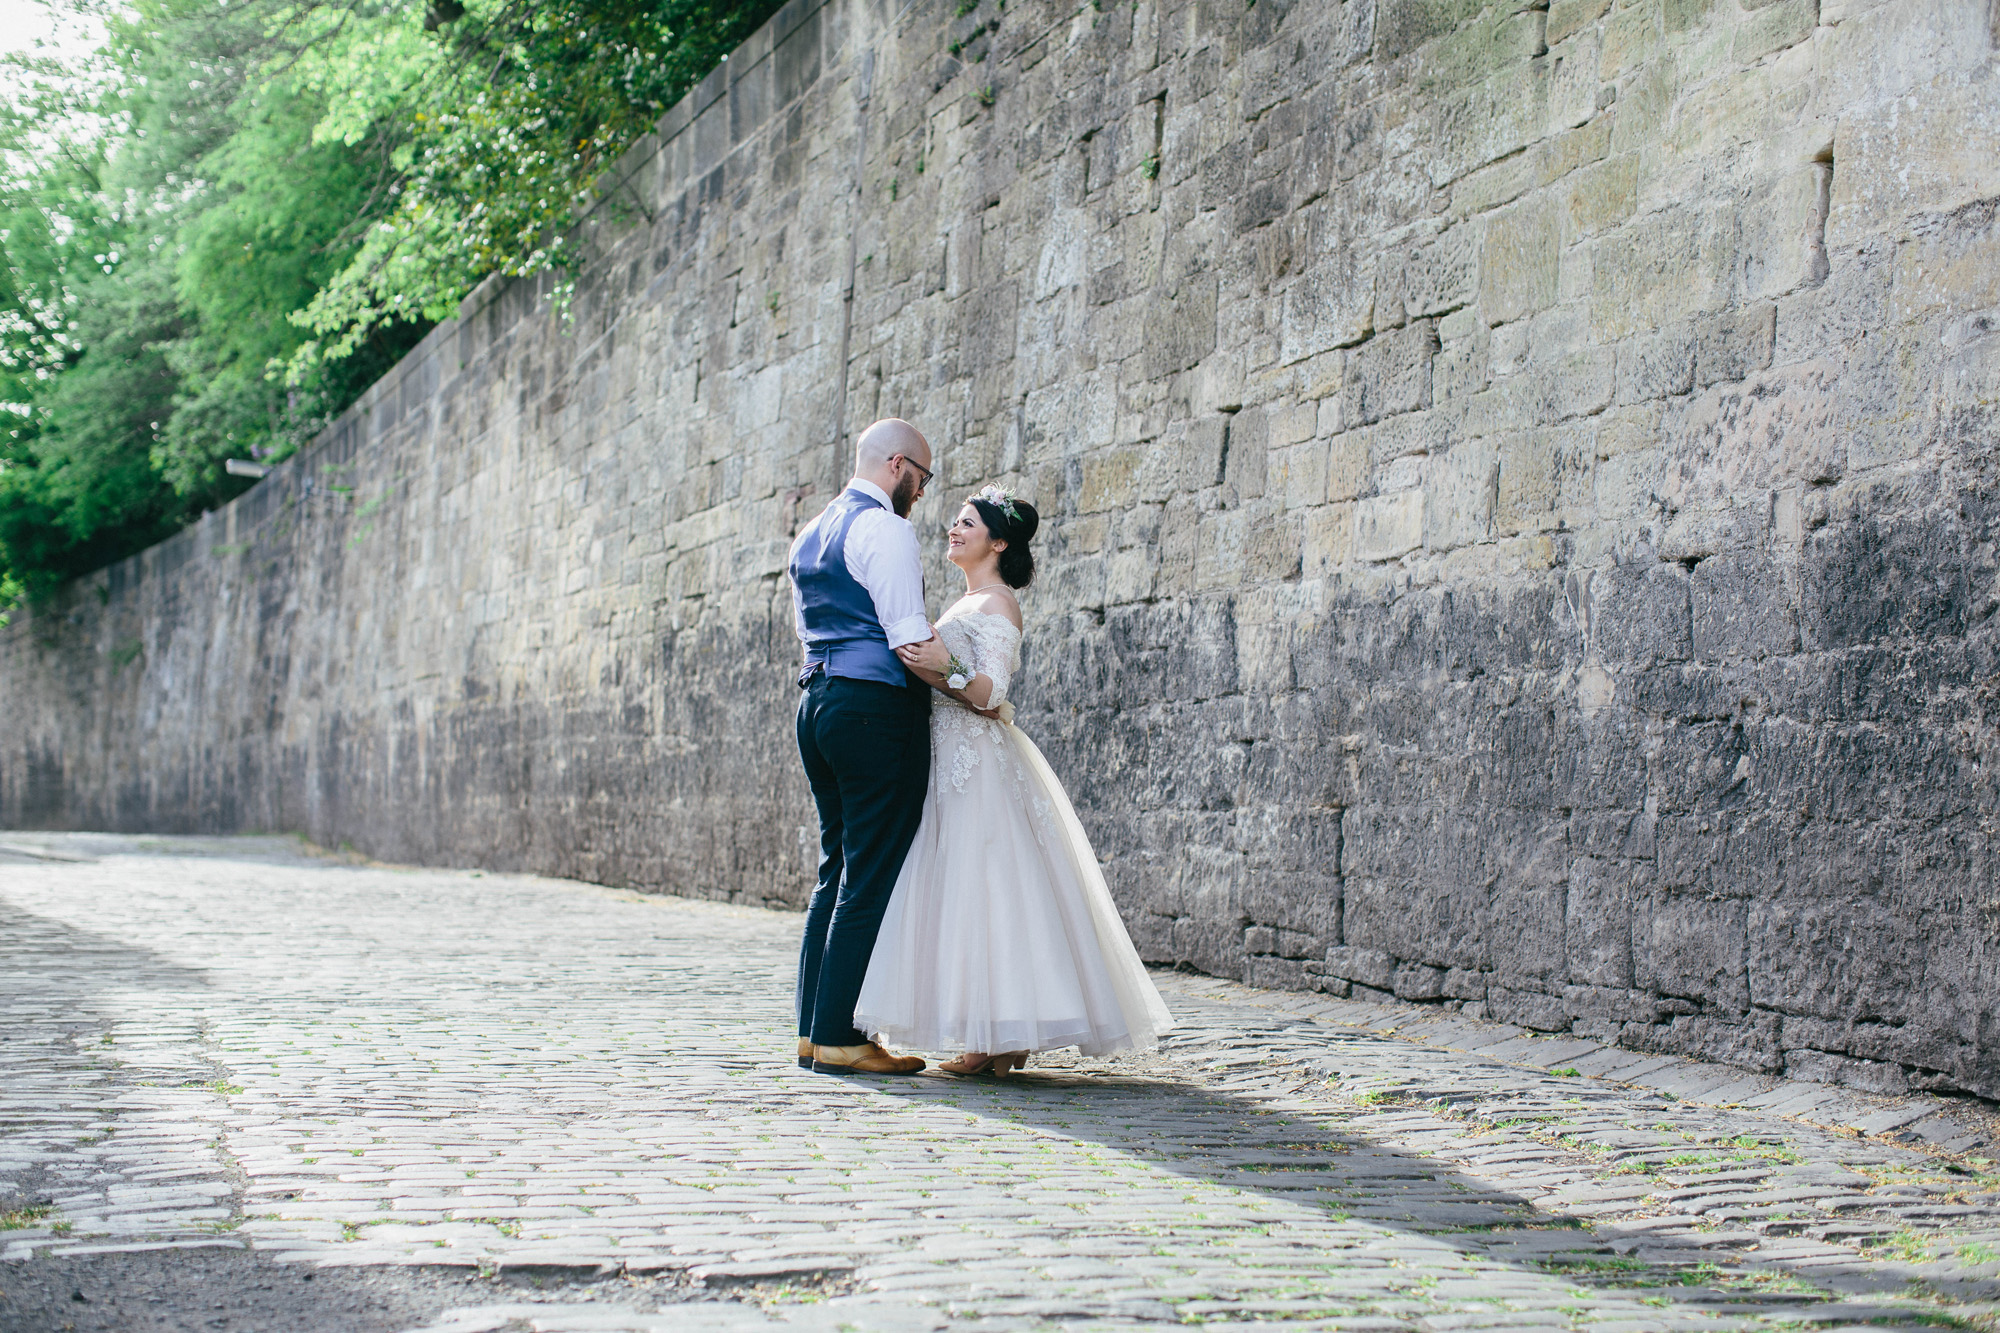 Quirky Wedding Photography Glasgow West End 059.jpg